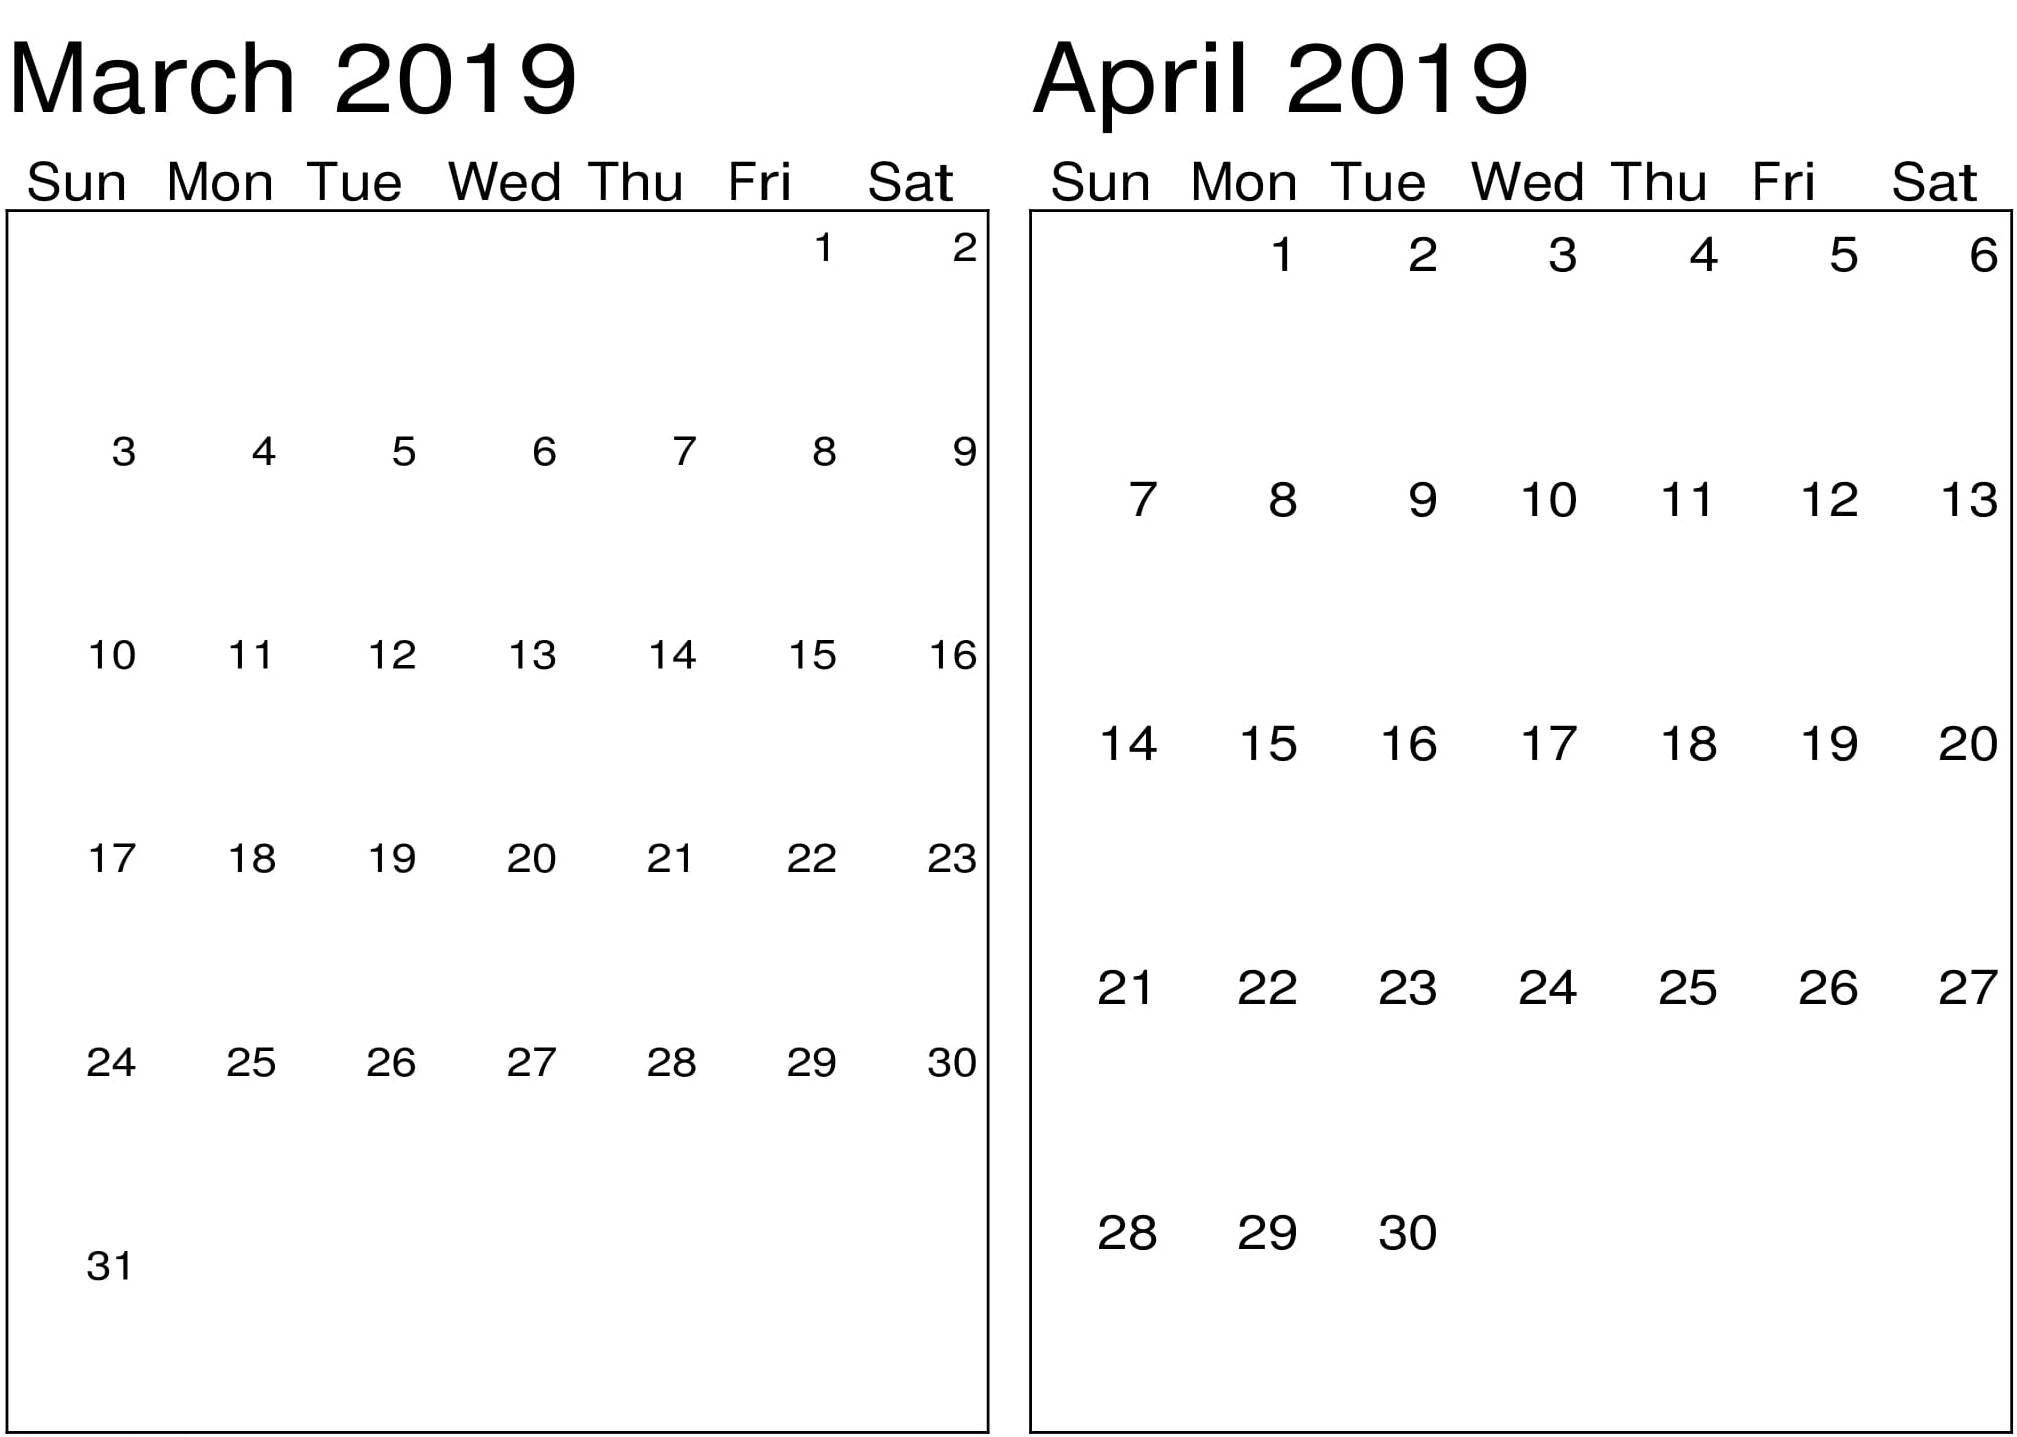 March April 2019 Printable Calendar – Printable Calendar Templates Calendar 2019 March April